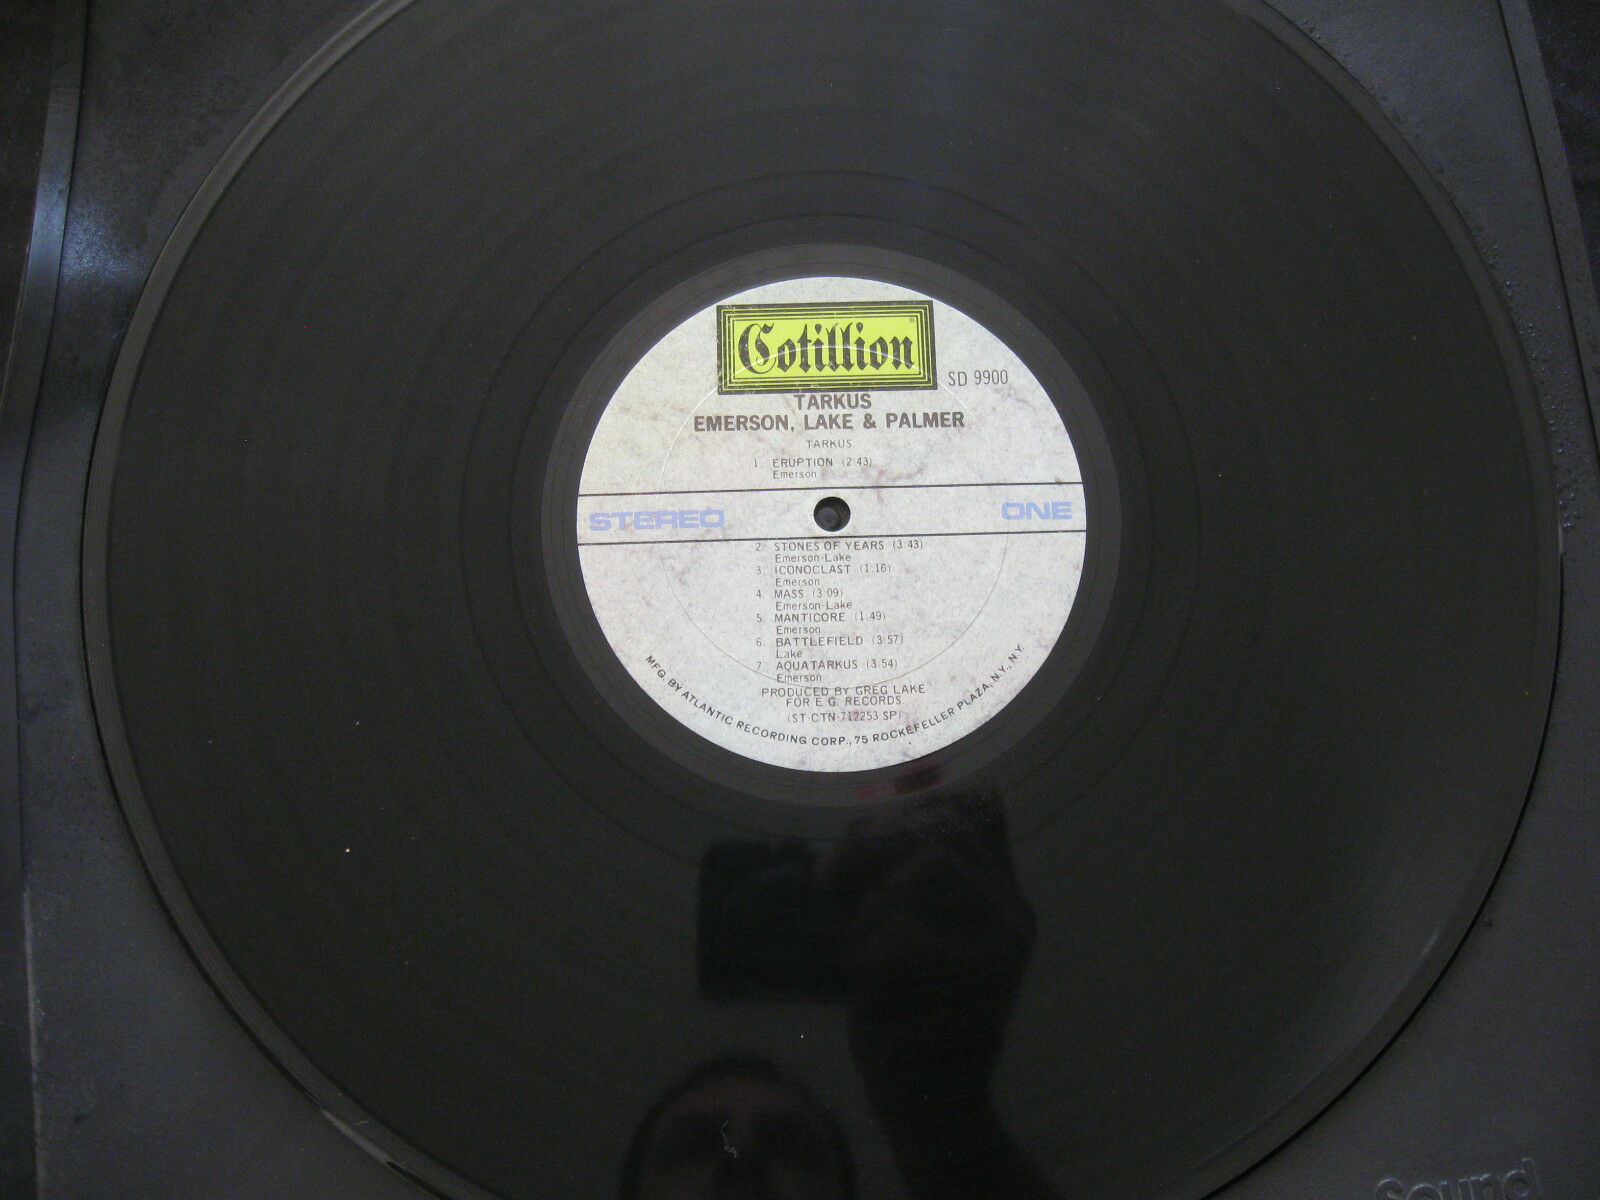 Emerson Lake & Palmer ELP Tarkus Cotillion SD 9900 Stereo Vinyl LP Record Album image 4